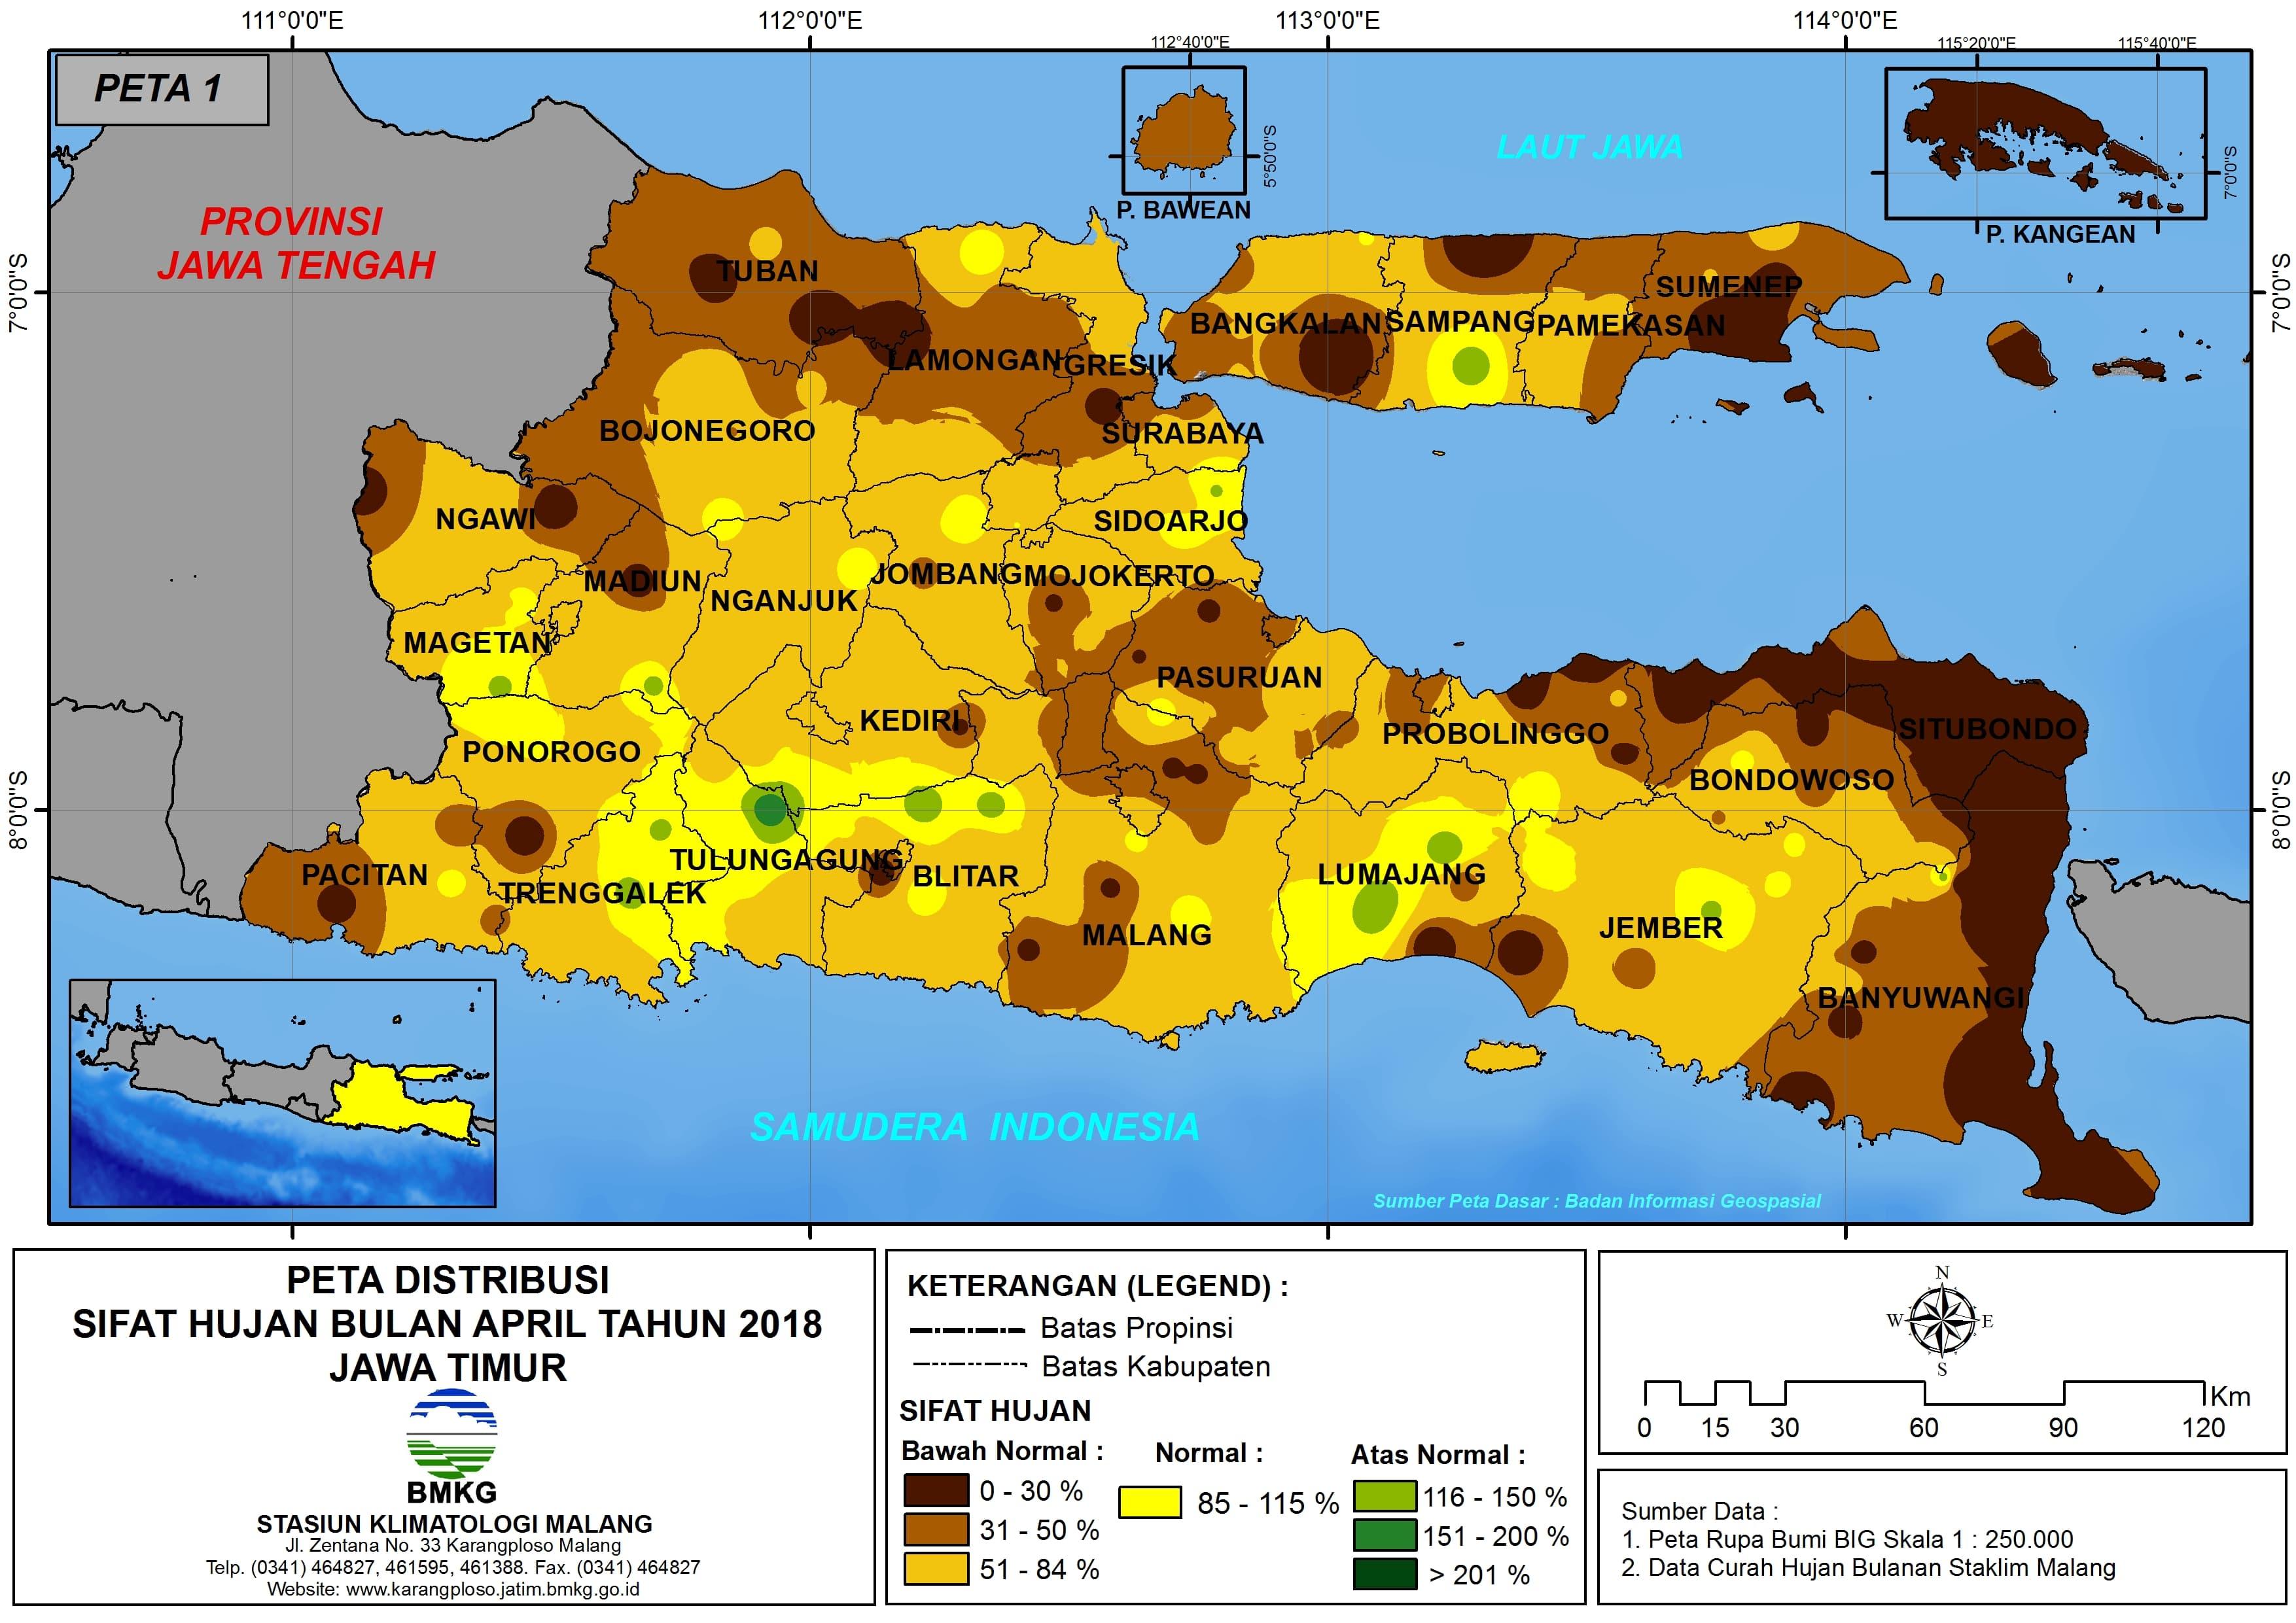 Analisis Distribusi Sifat Hujan Bulan April Tahun 2018 di Propinsi Jawa Timur